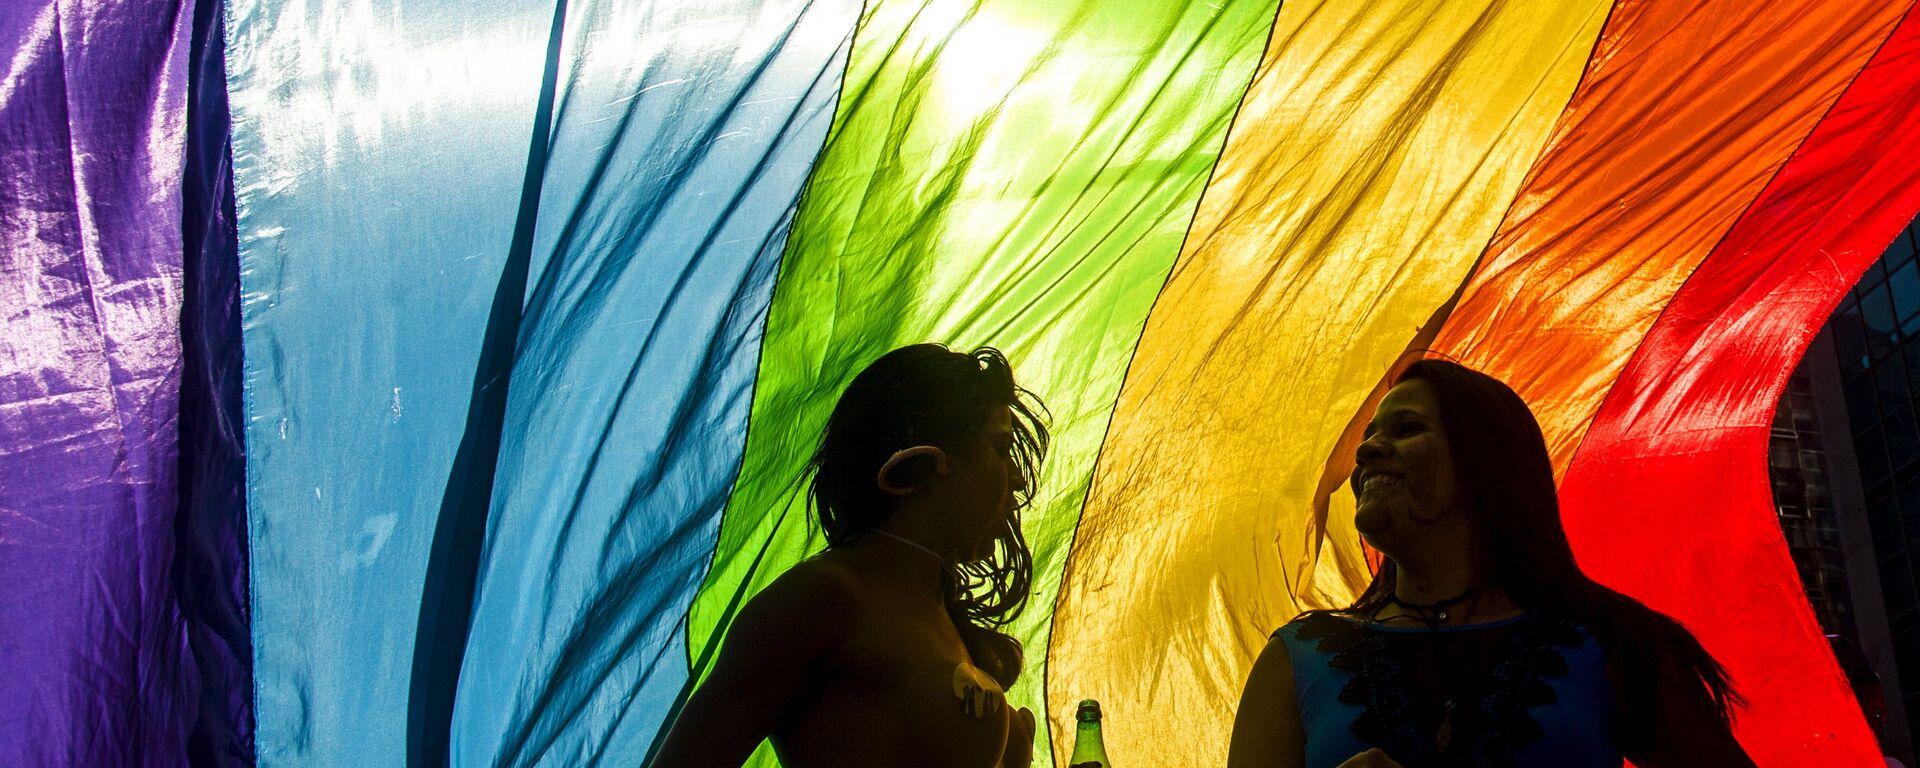 Revellers take part in the 19th Gay Pride parade along Paulista Avenue in Sao Paulo, Brazil, June 7, 2015 - Sputnik Mundo, 1920, 11.07.2019